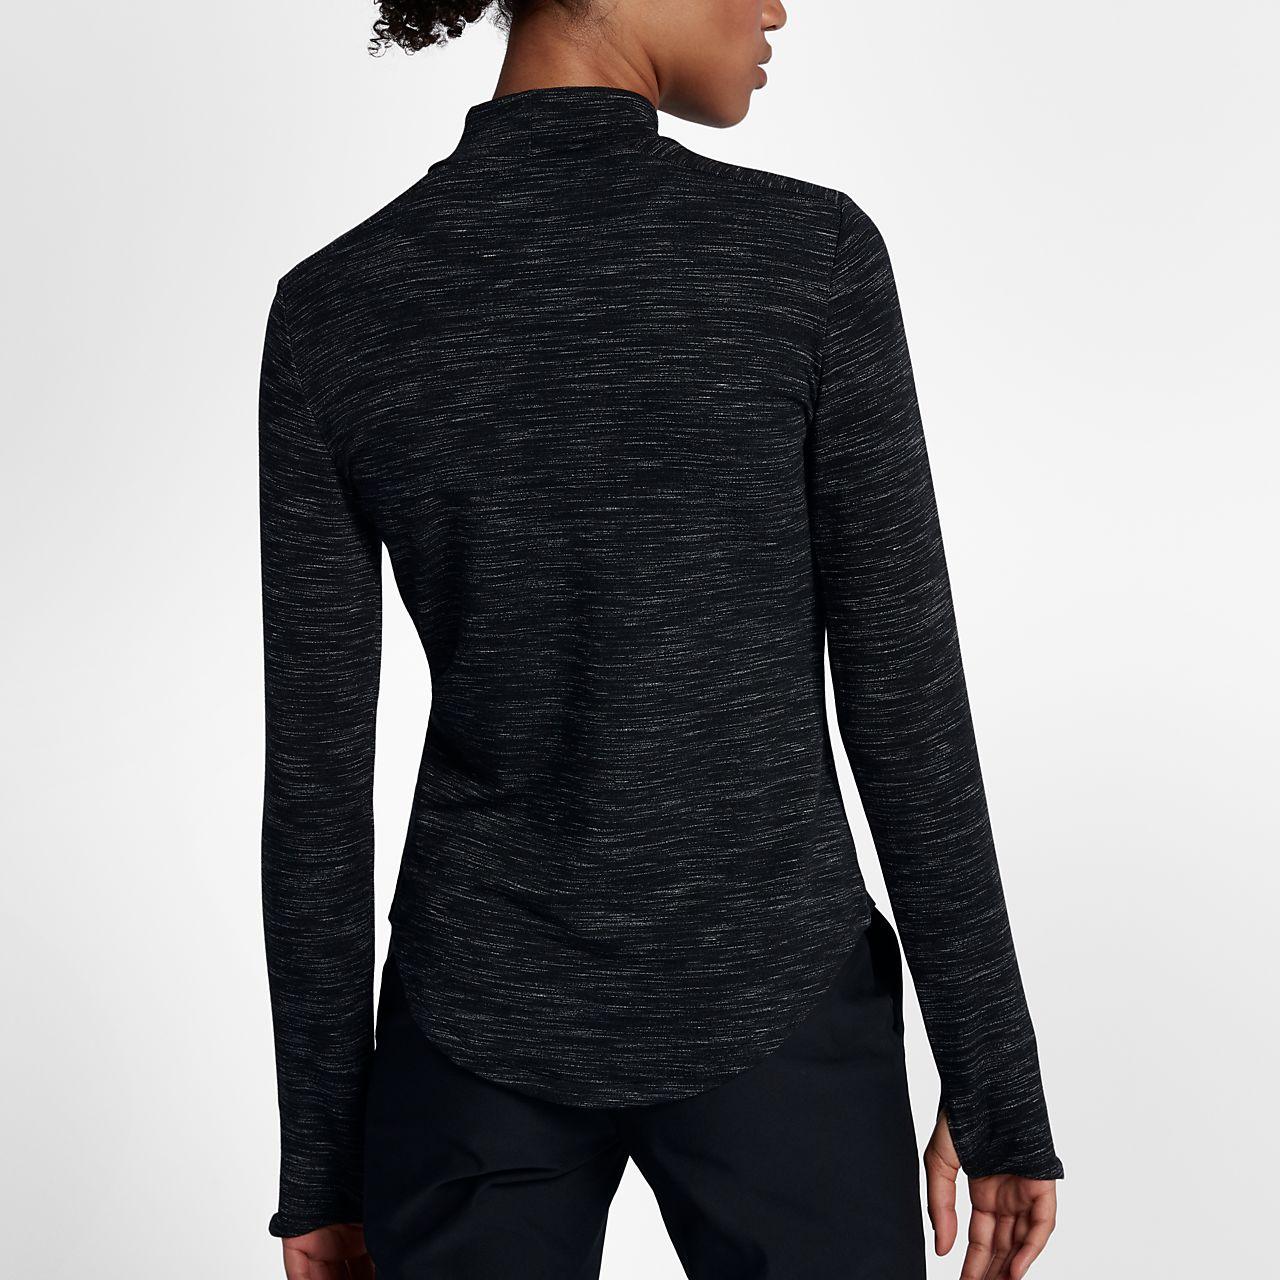 nike dry women 39 s long sleeve golf top. Black Bedroom Furniture Sets. Home Design Ideas